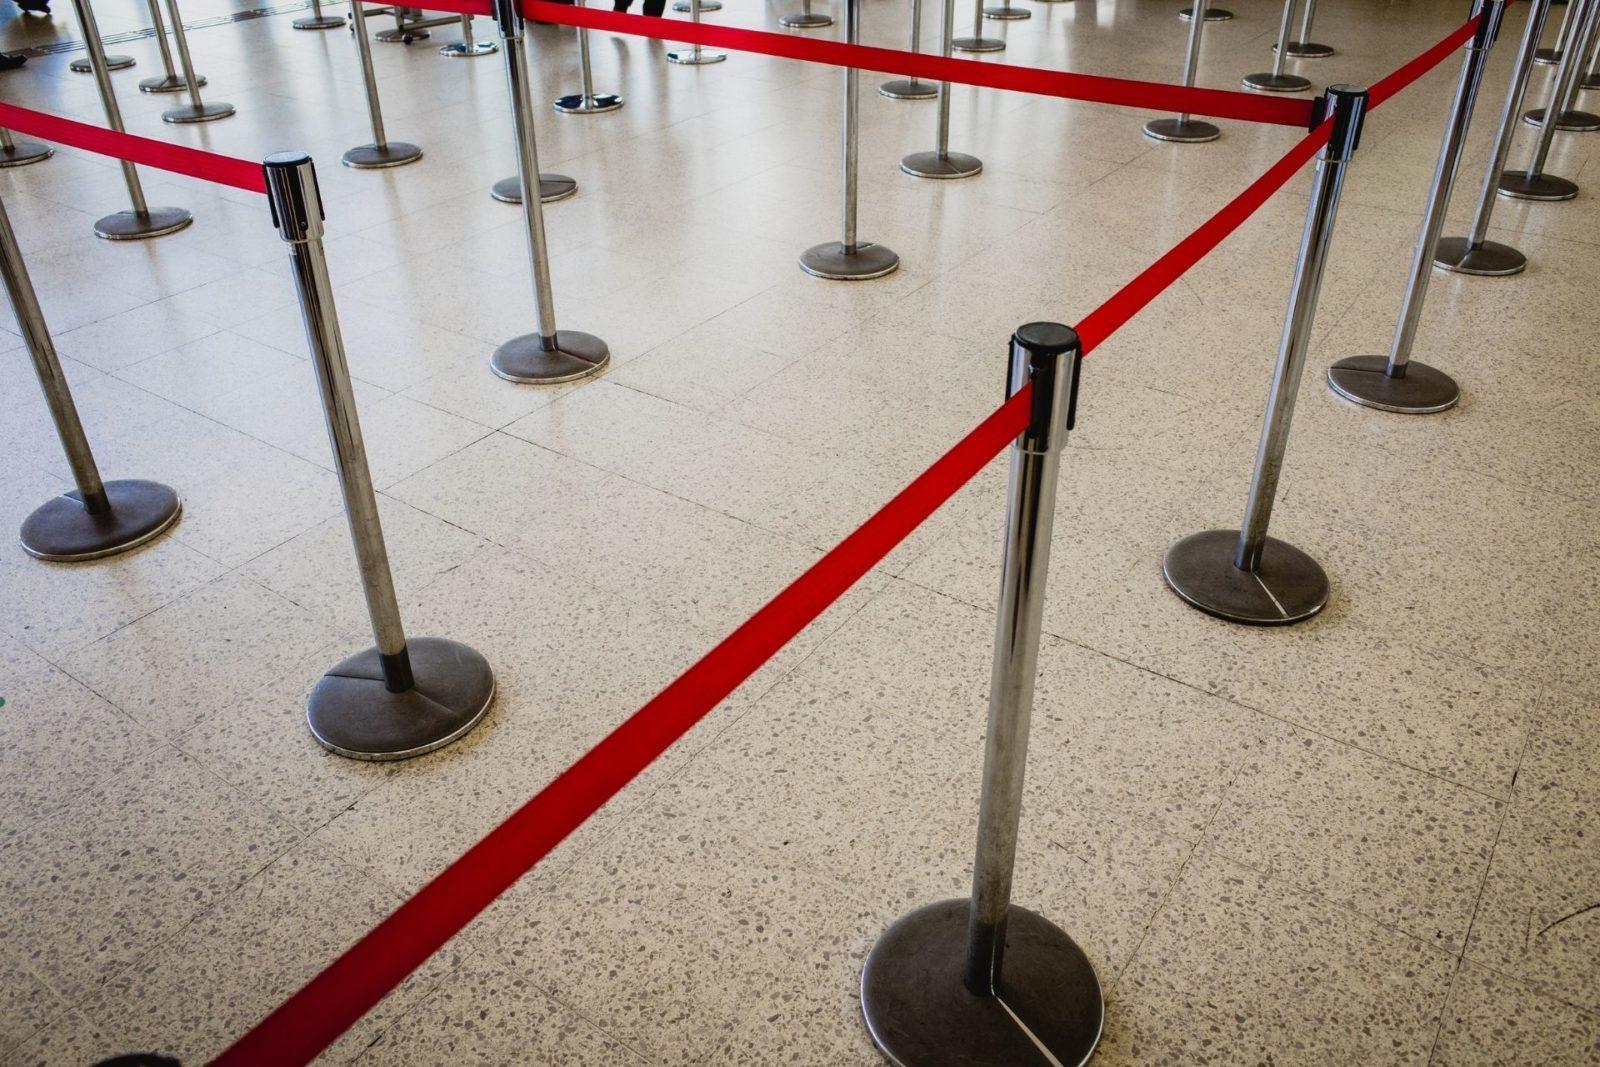 barreira filas atrasos pagamento precatorios federais 2020 precato